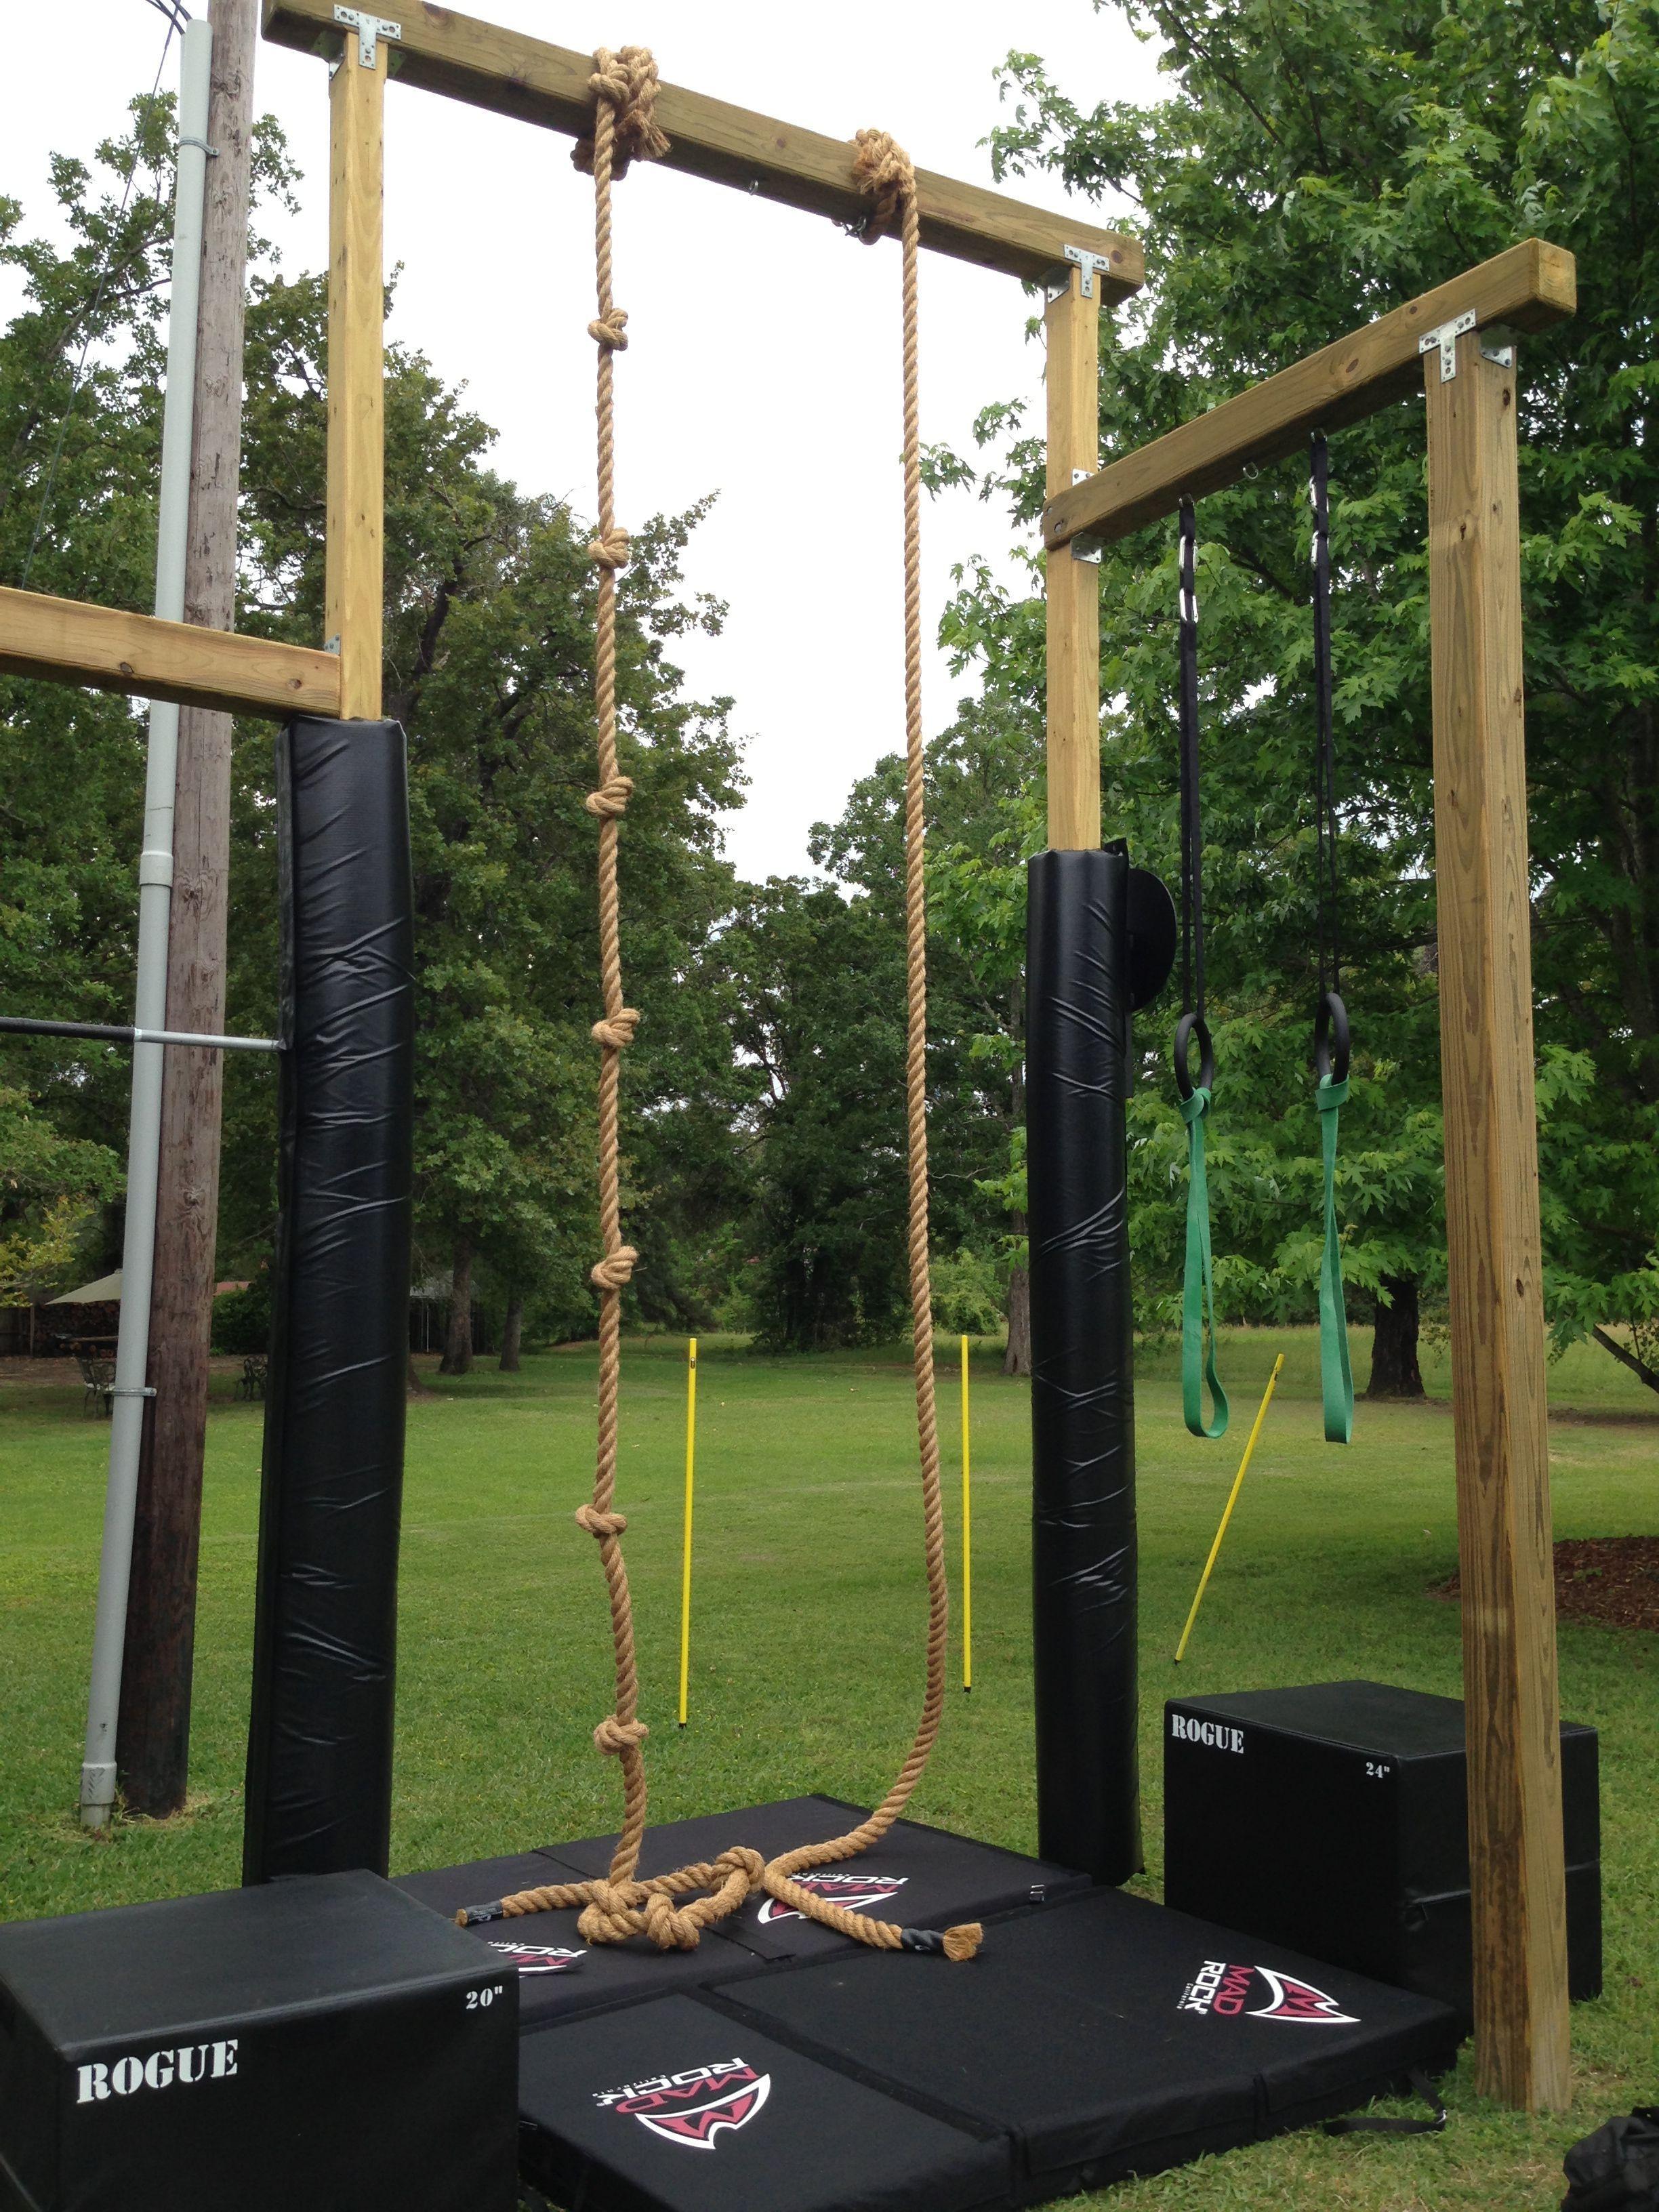 Repinned Repinned Crossed Fitness Crossed Byrogue Fitness Irons Rogue Climb Irons Climb Rope Rock Pa Backyard Gym Diy Home Gym Diy Gym Equipment